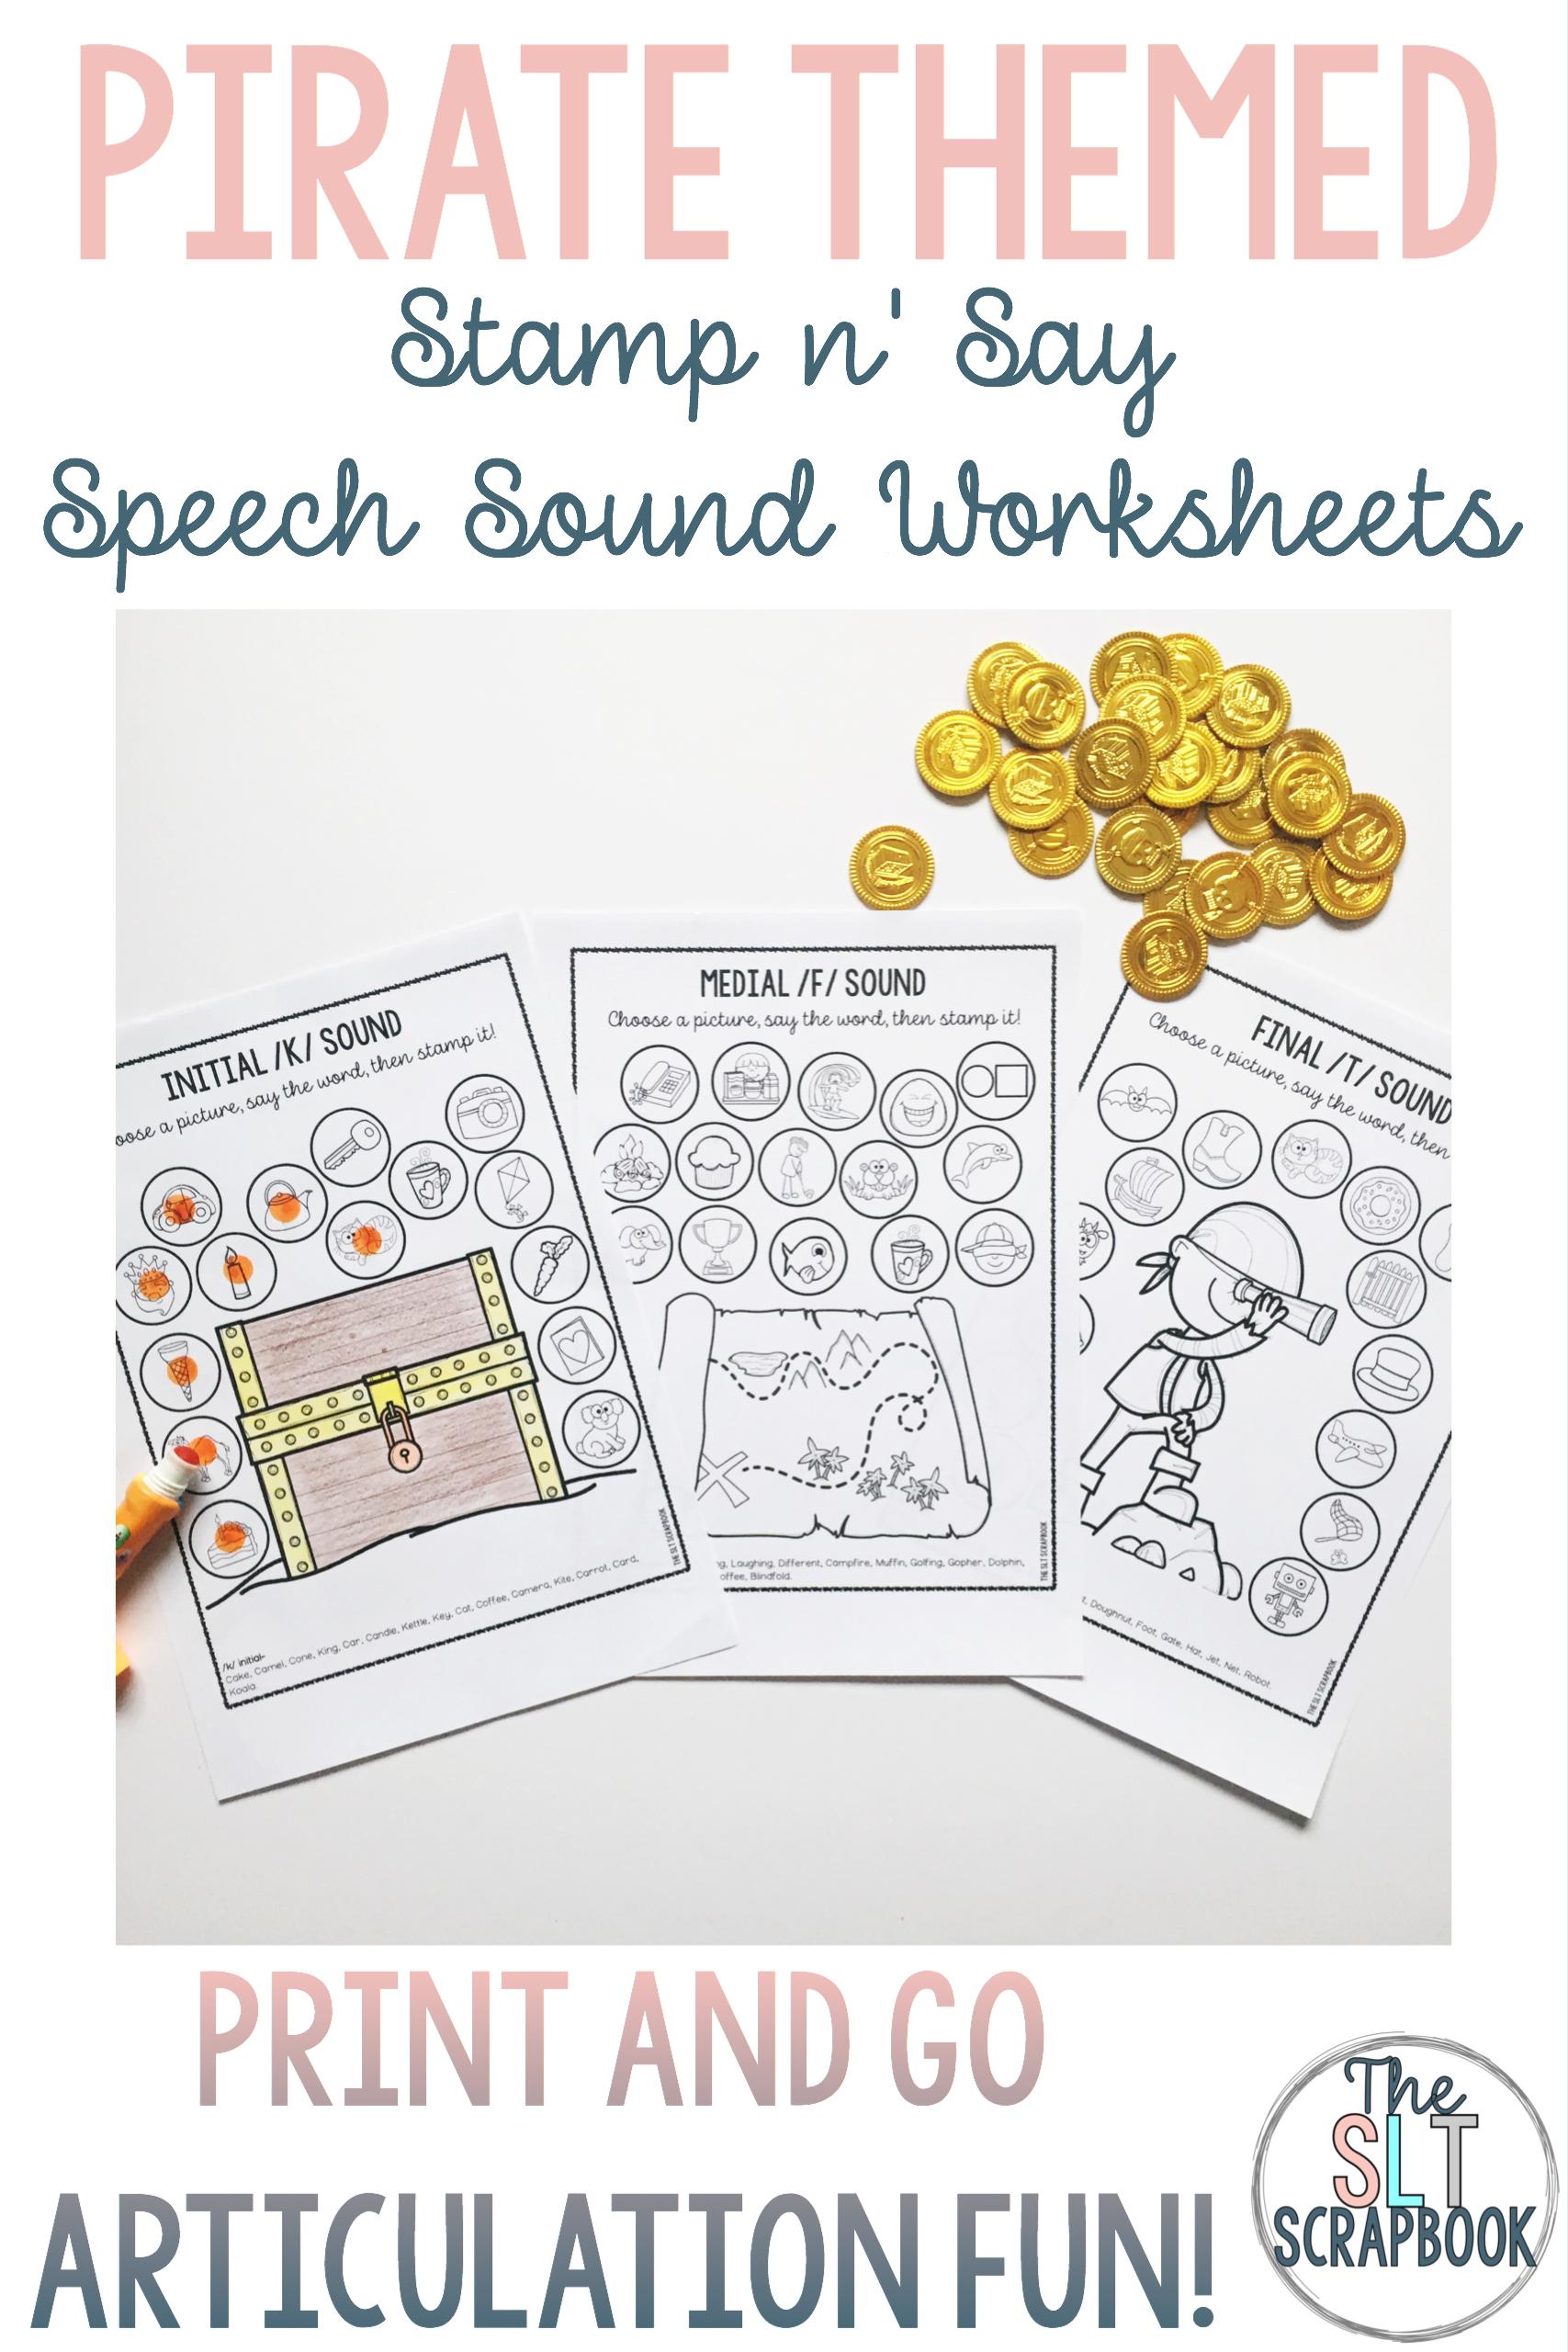 Pirate Themed Speech Sound Worksheets No Prep